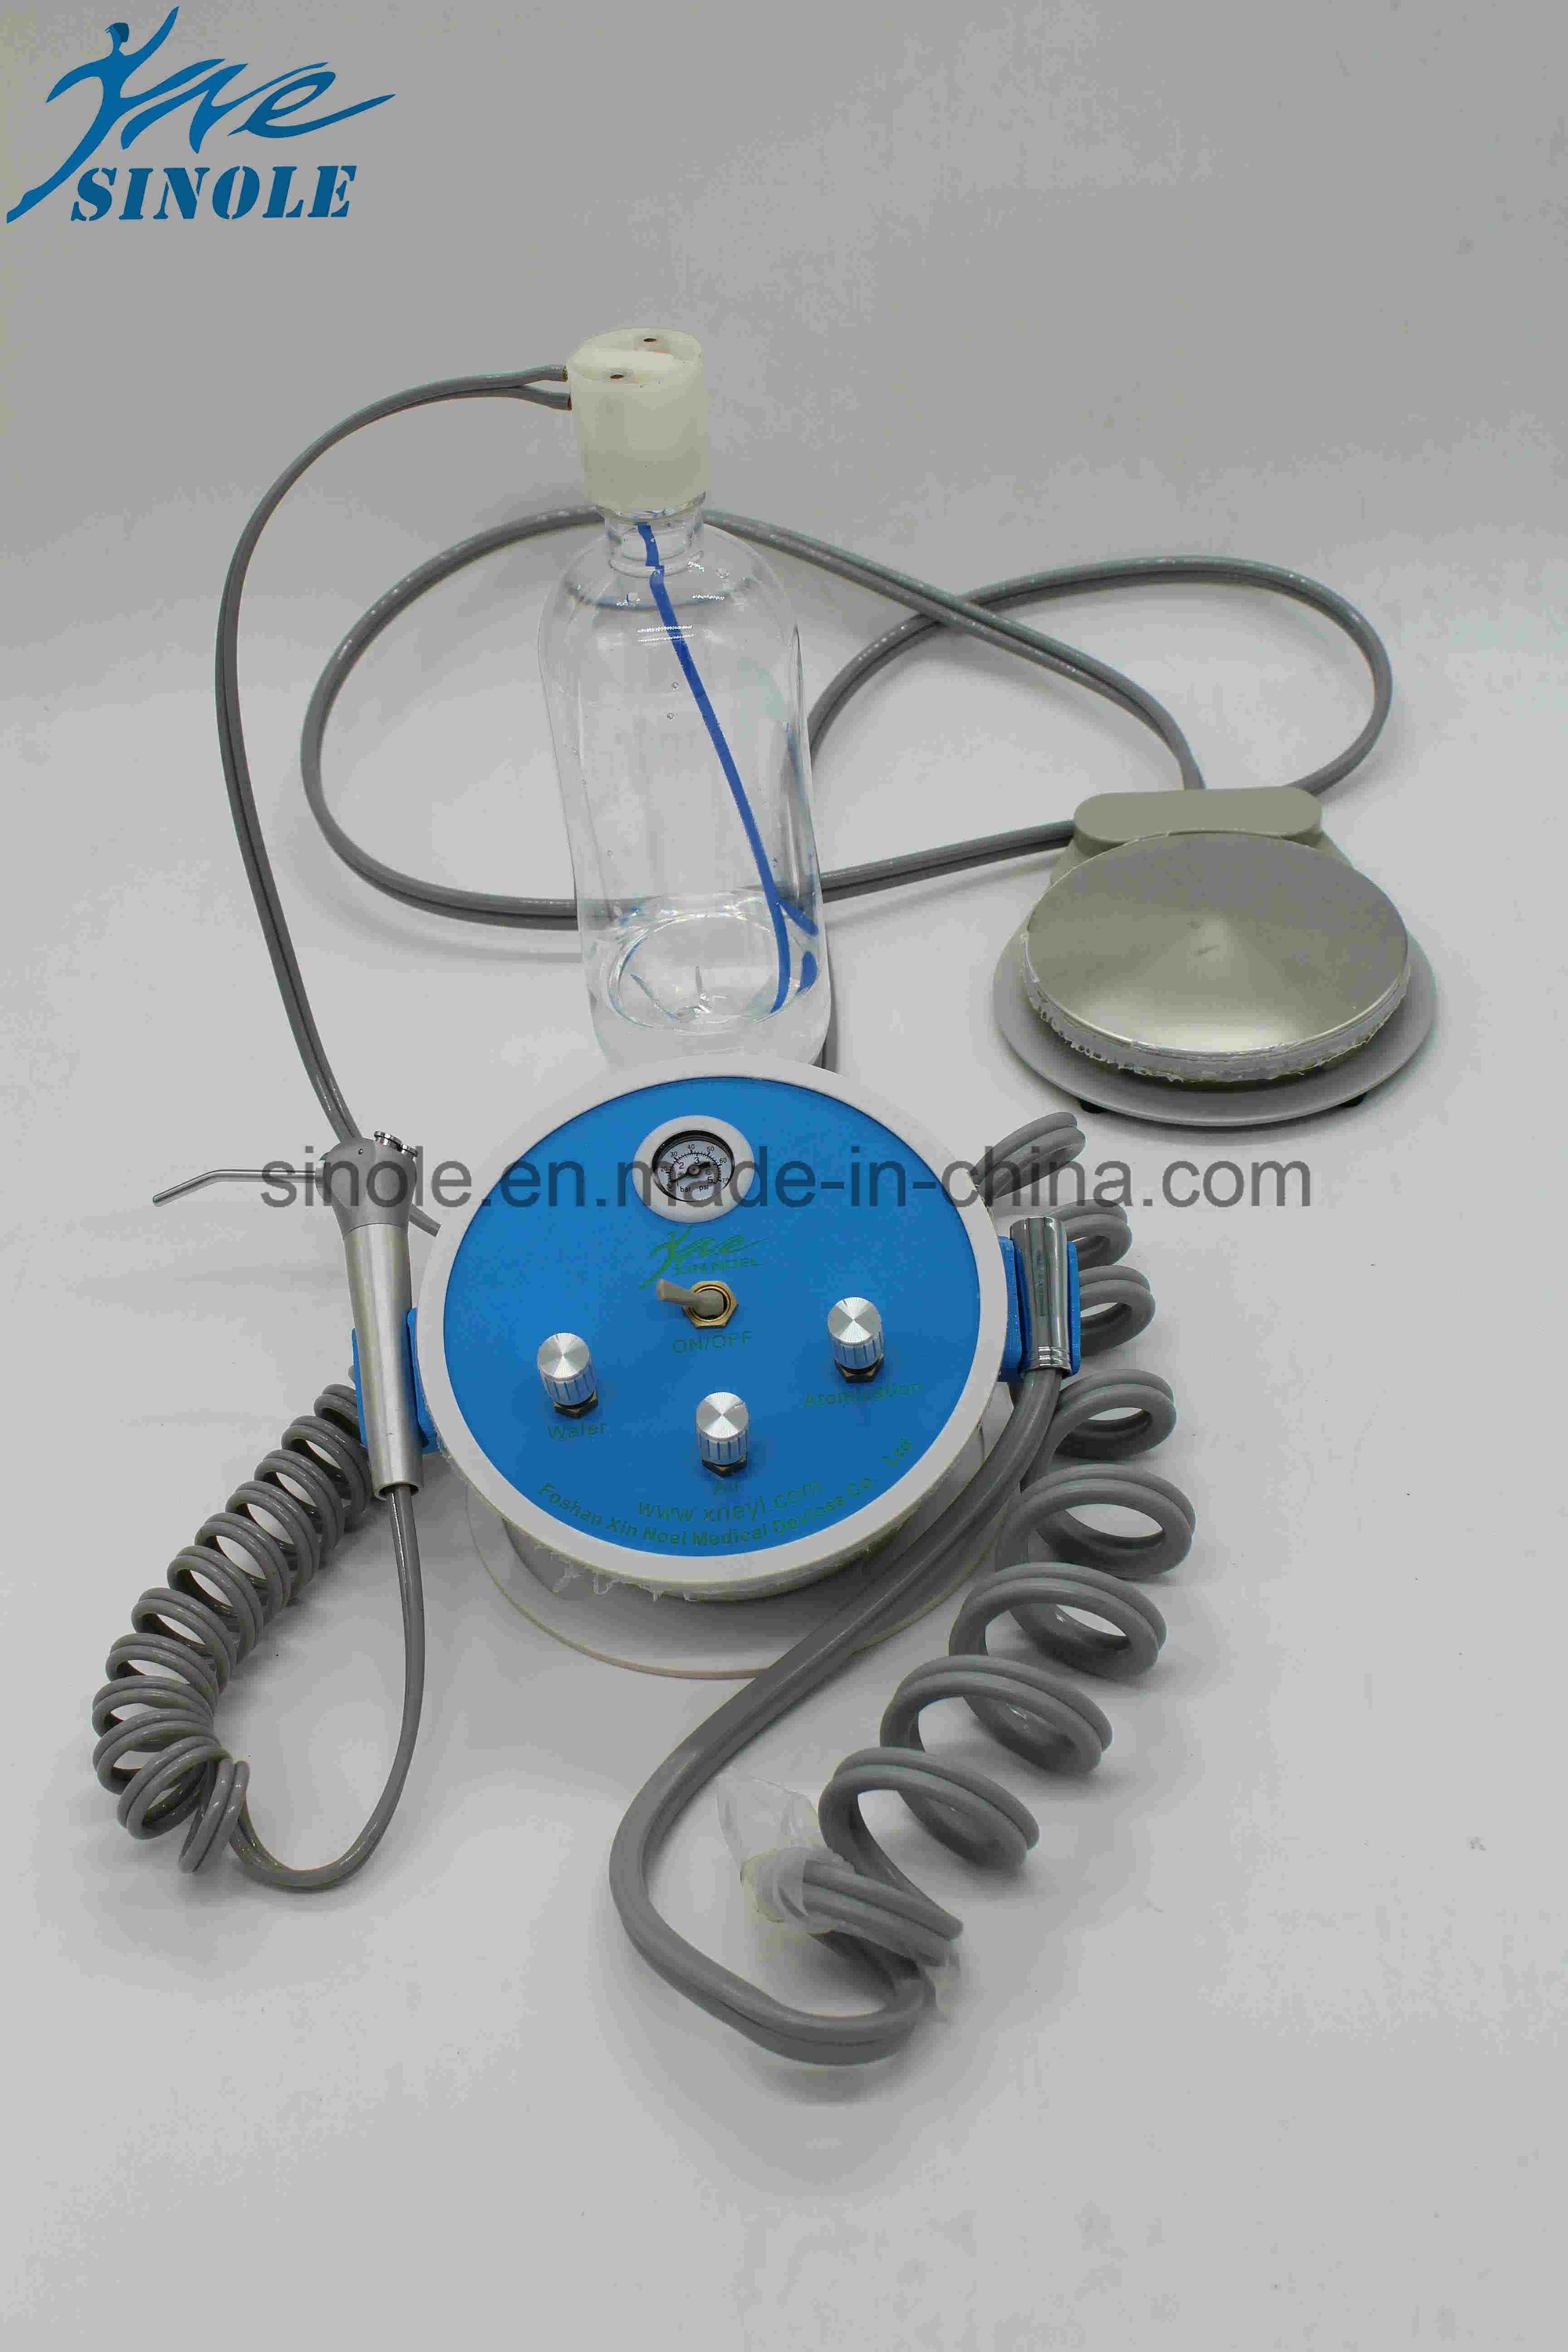 Plastic Portable Dental Unit with Syringe (7-01)